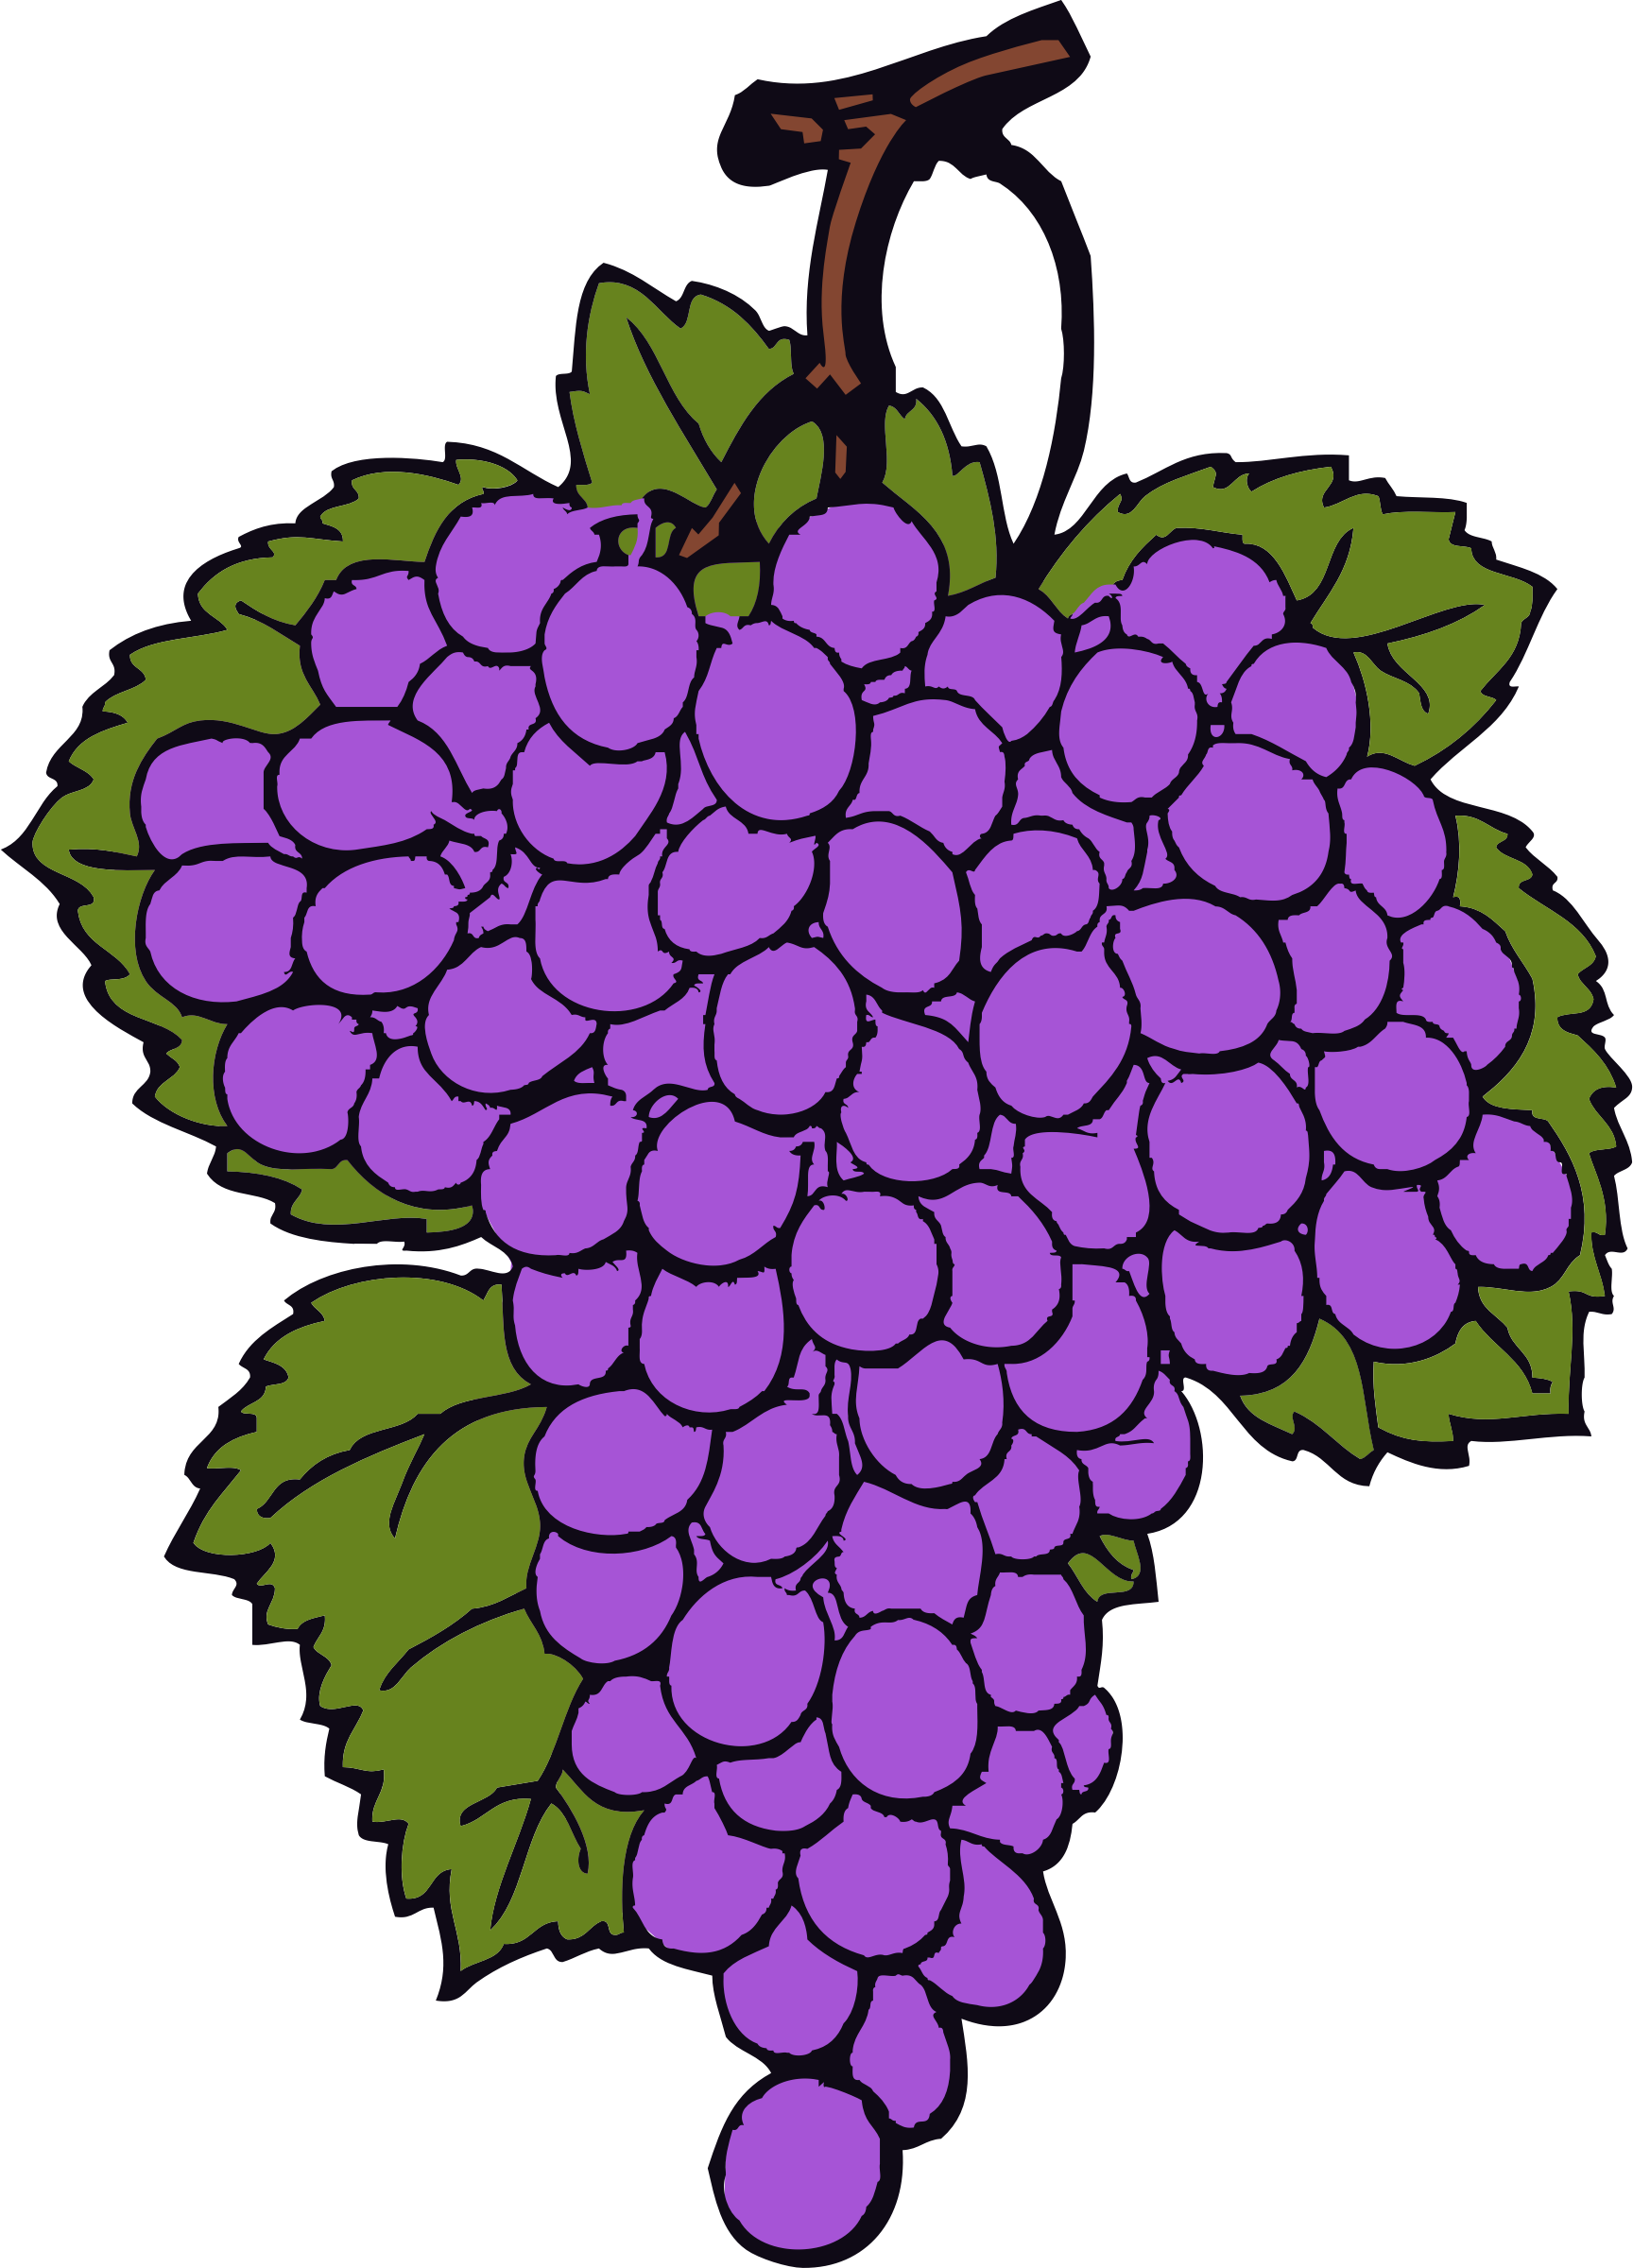 Grape cluster big image. Grapes clipart violet